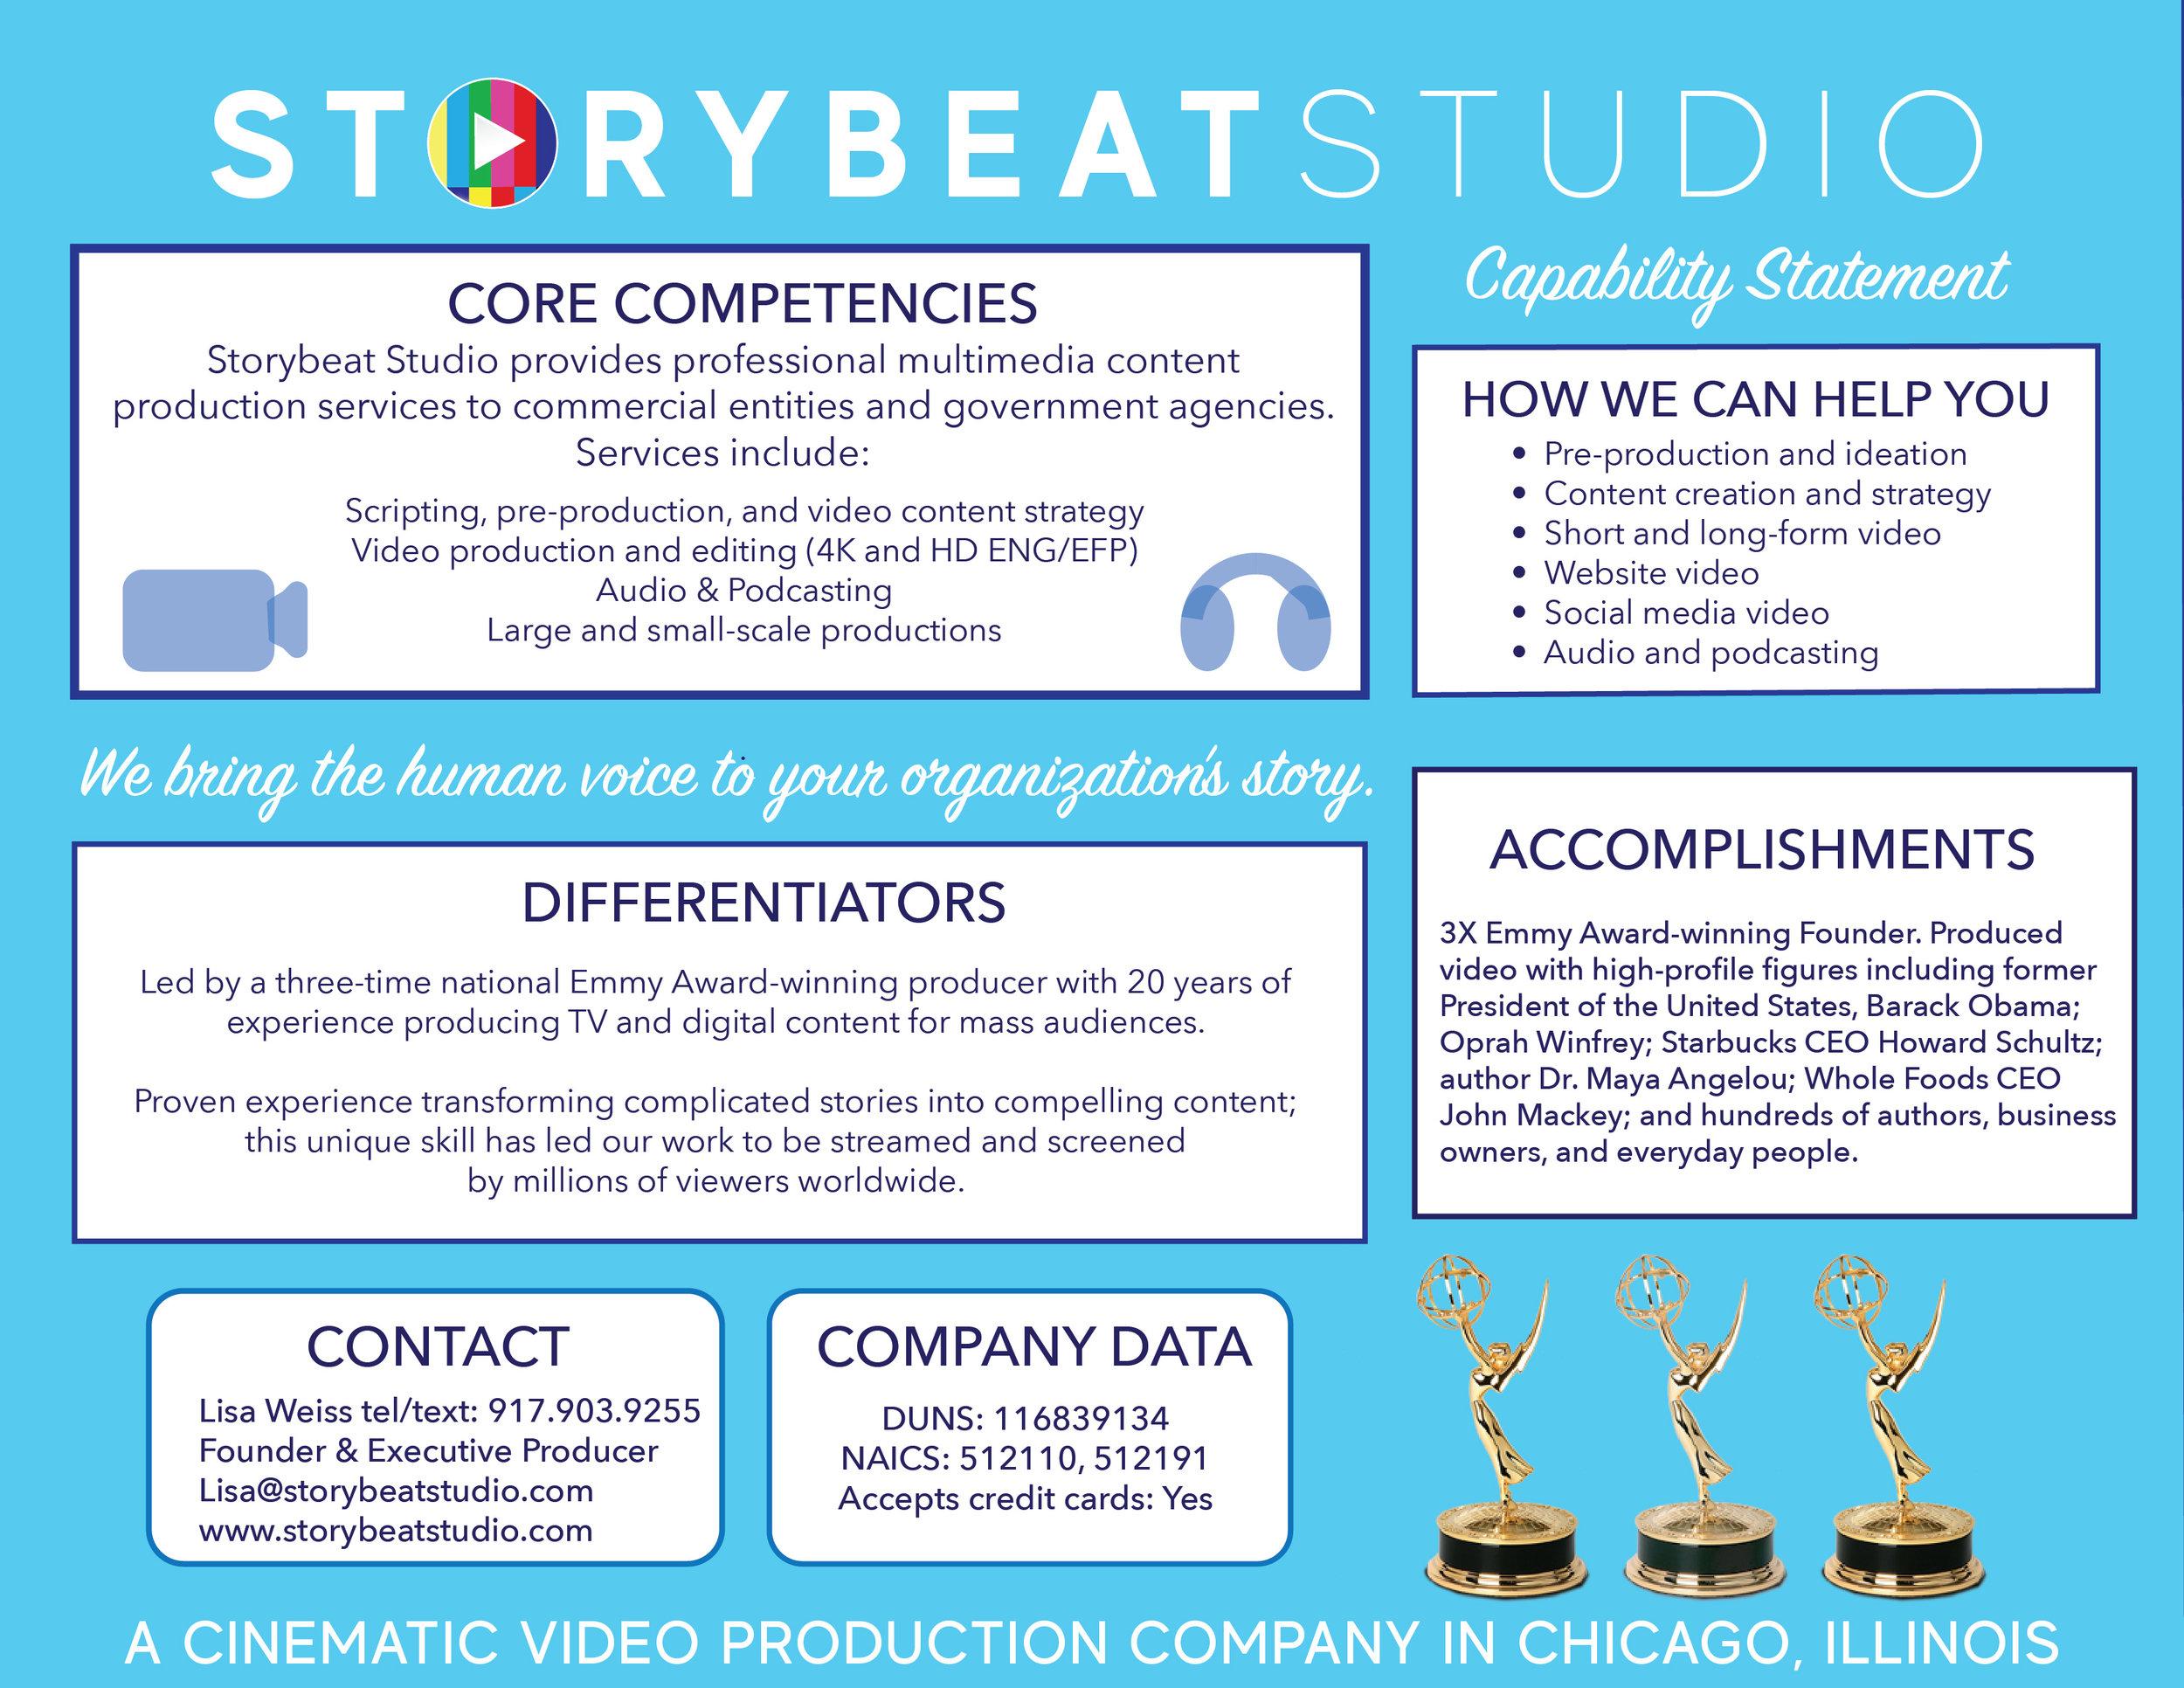 StorybeatStudioCapabilityStatement-01.jpg